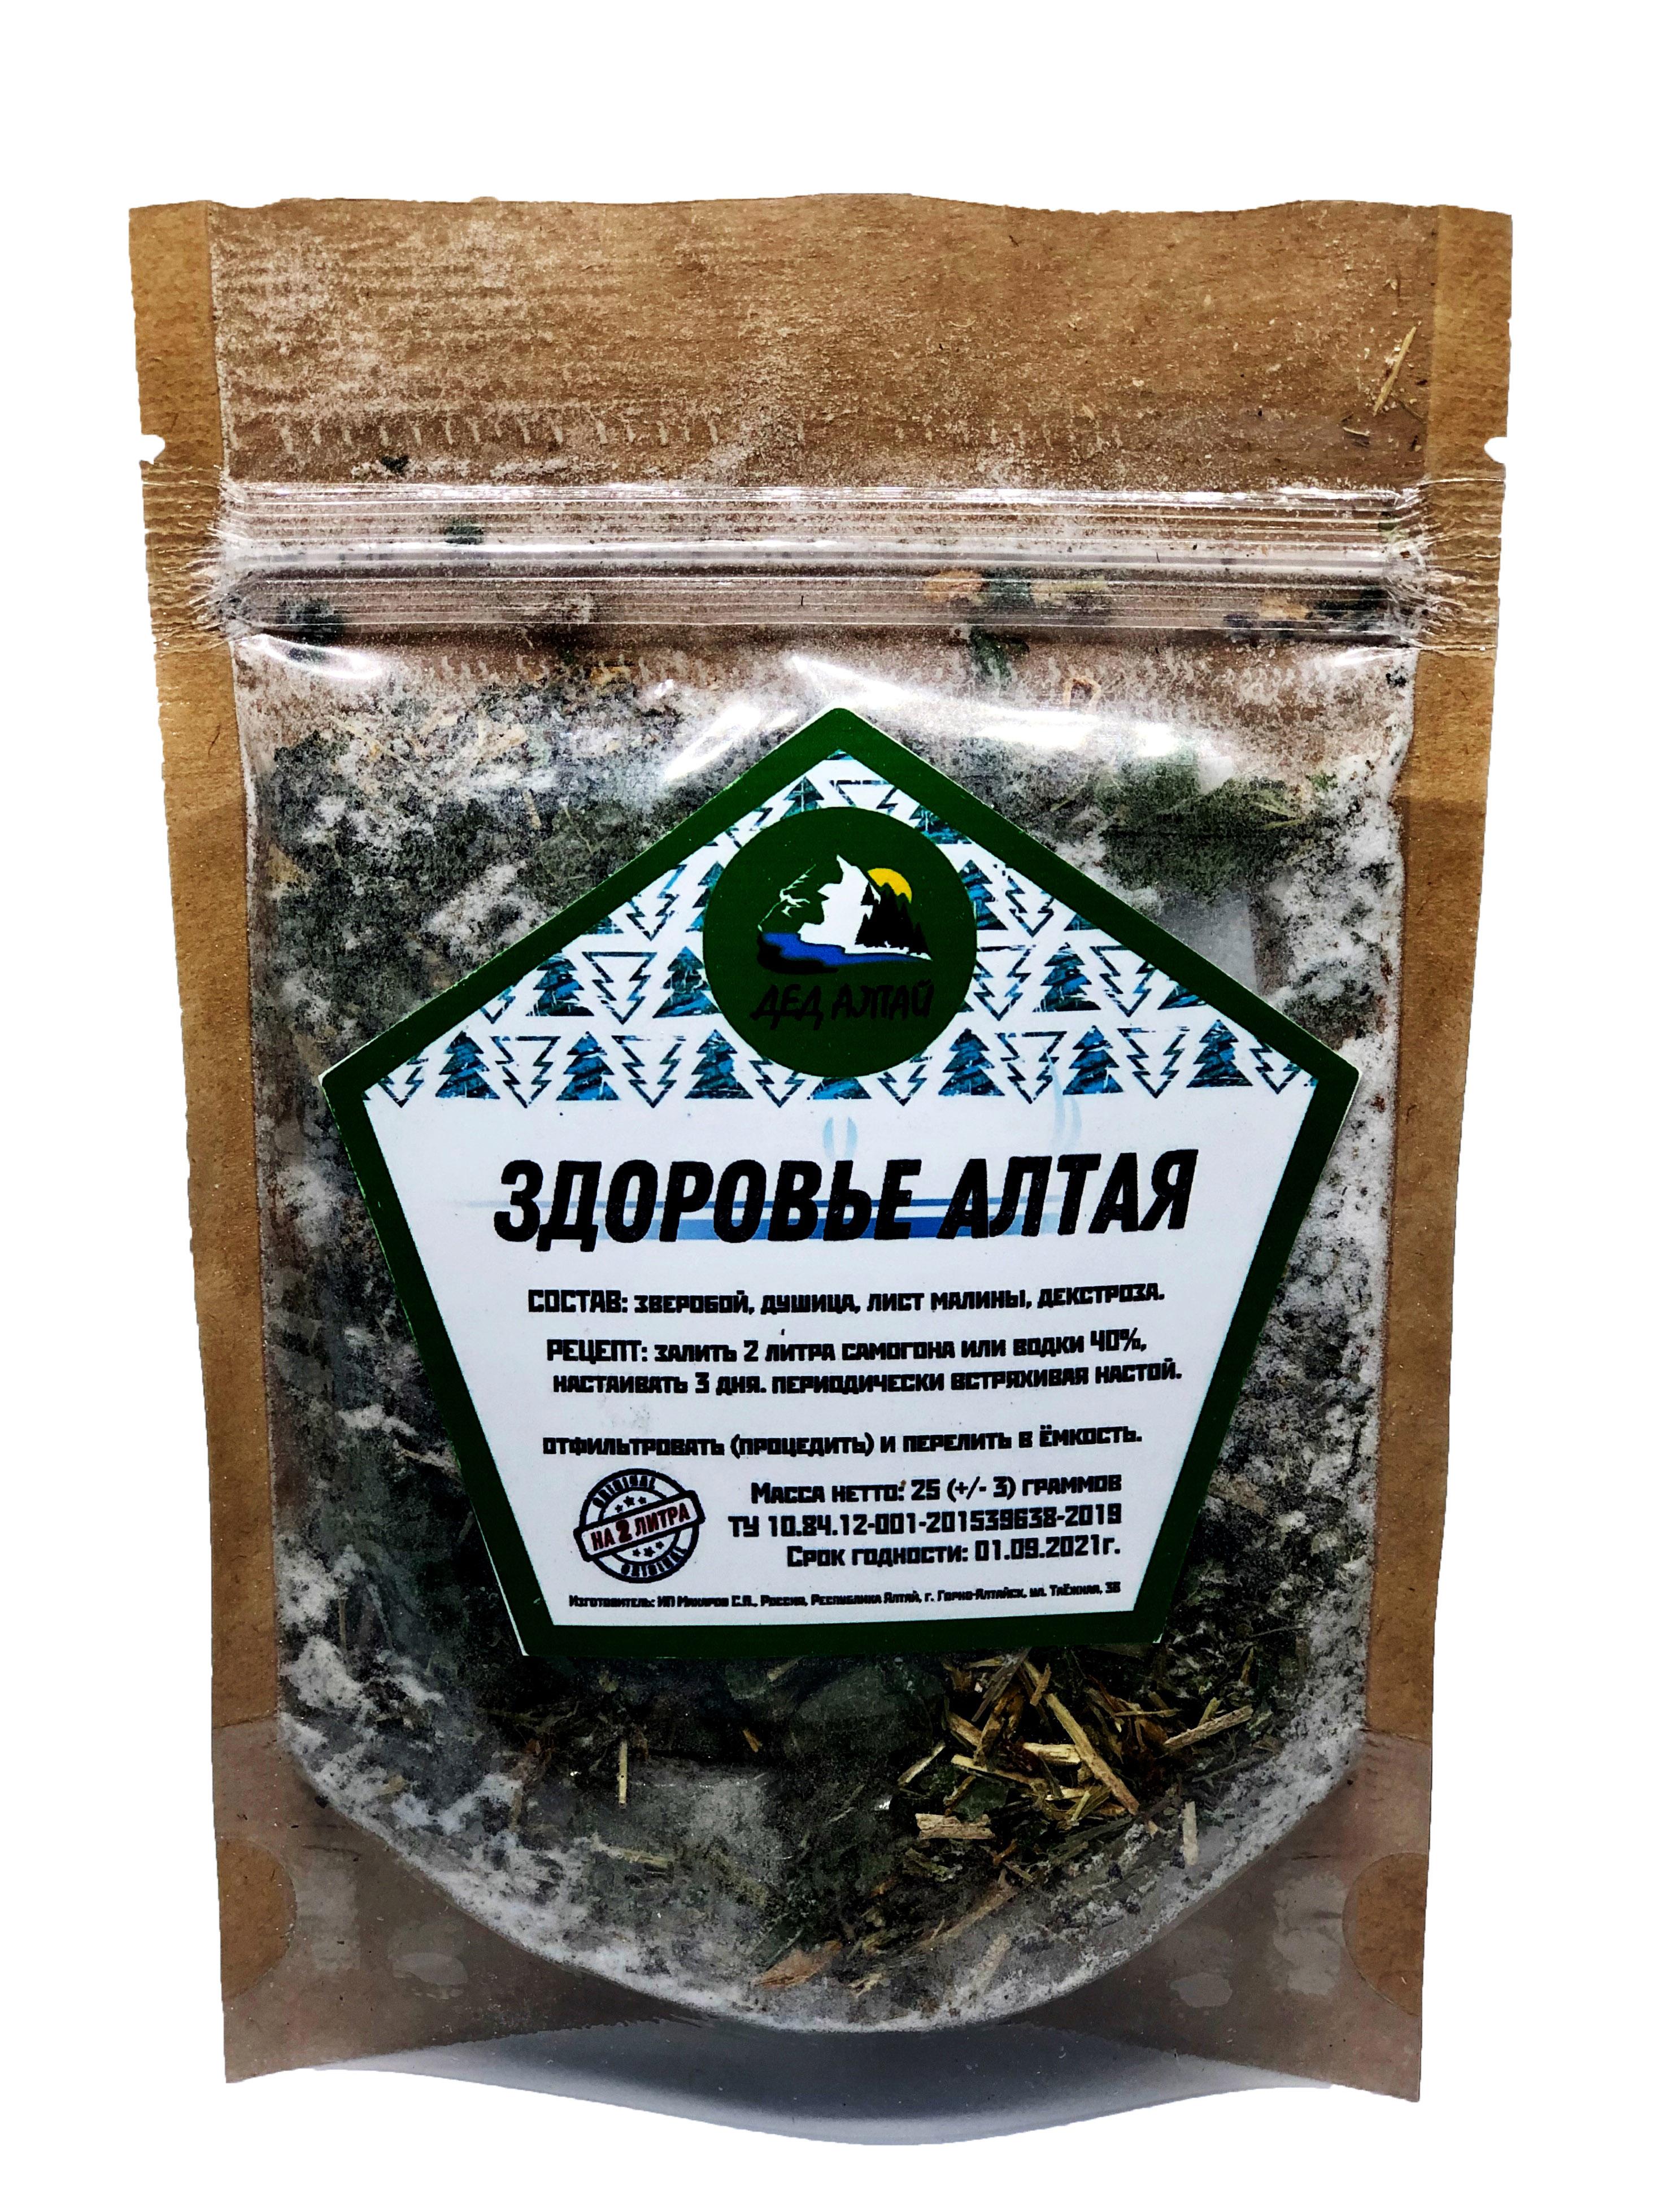 A Set Of Herbs And Spices Santa Алтай Health Алтая Tincture Distillate Improvement Moonshine Vodka Home Alcohol